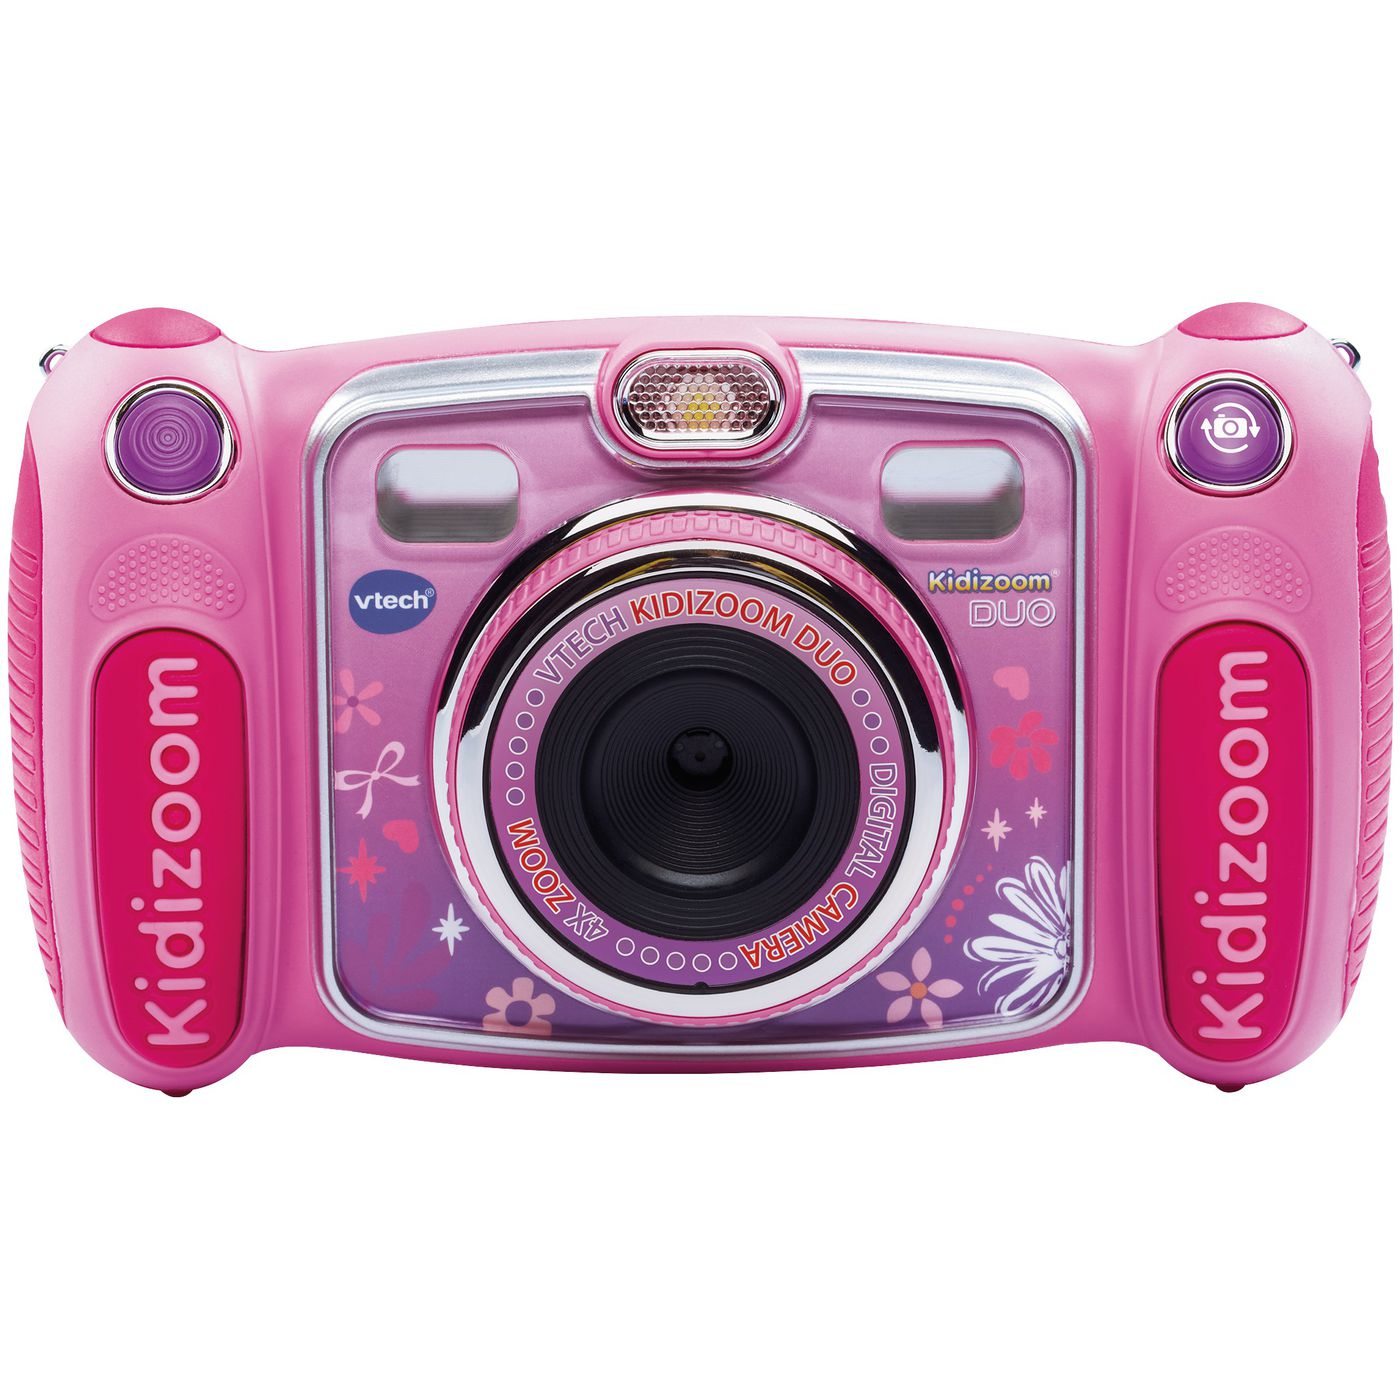 VTech 80 цифровой детский фотоаппарат, Kidizoom Duo, с 4 лет